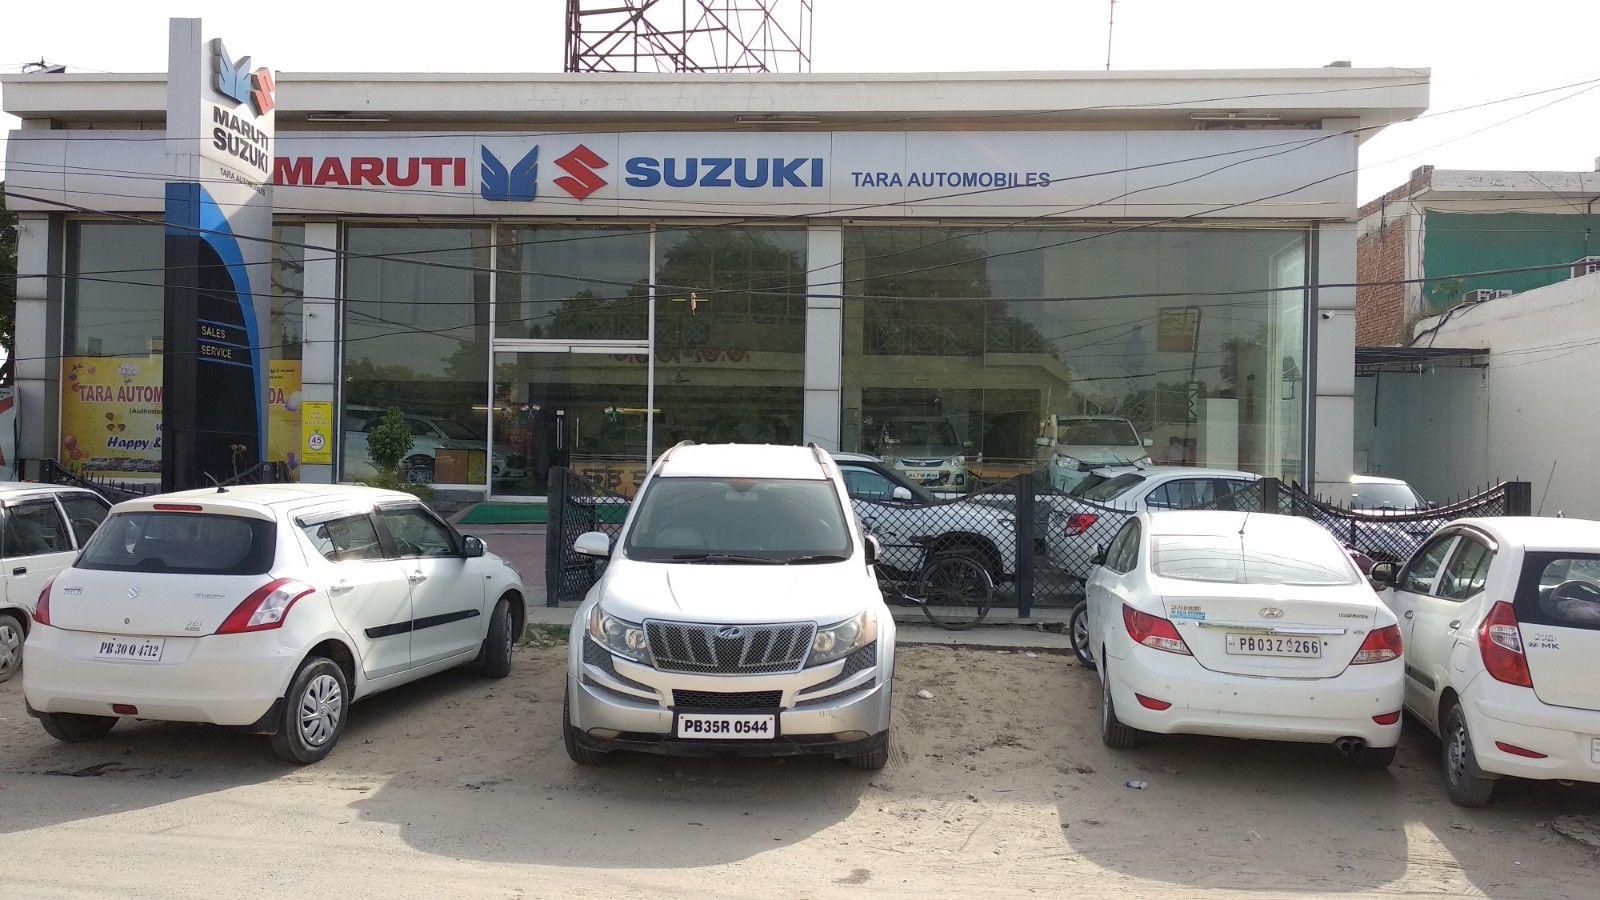 Suzuki Car Dealership >> Tara Automobiles Is A Maruti Suzuki Arena Dealer In Mansa